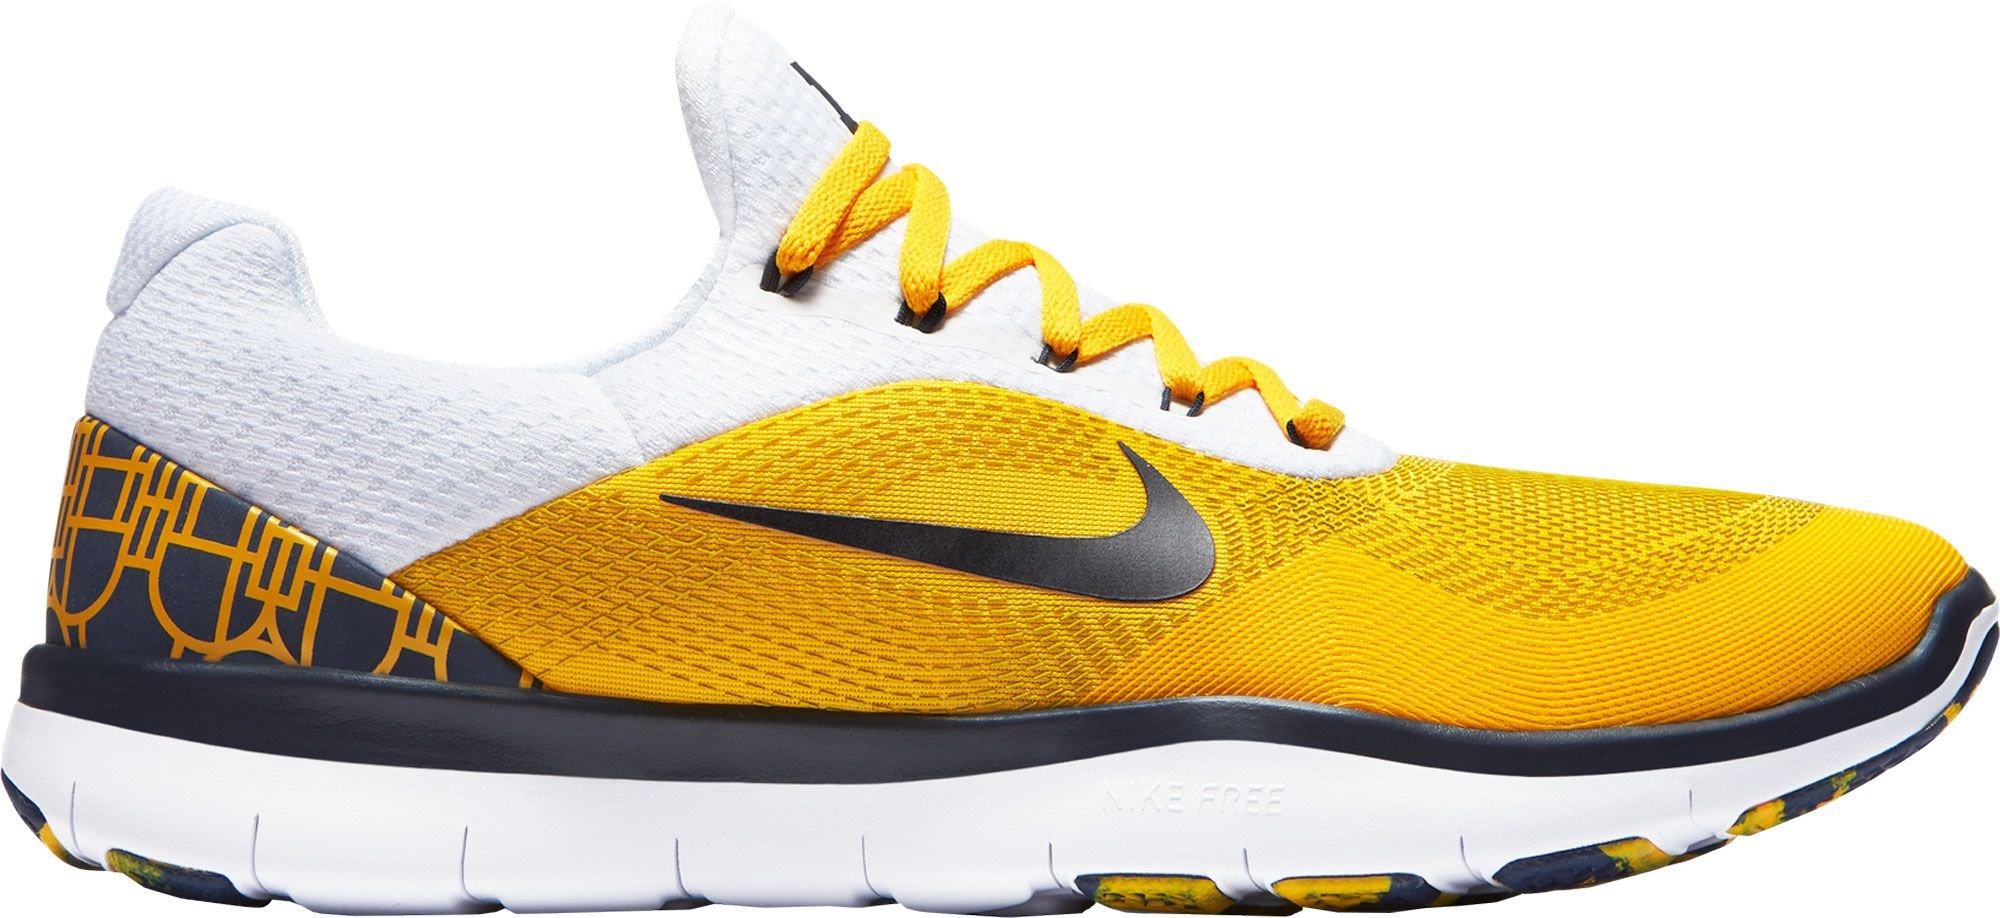 Nike Men's Free Trainer V7 Week Zero Michigan Edition Training Shoes